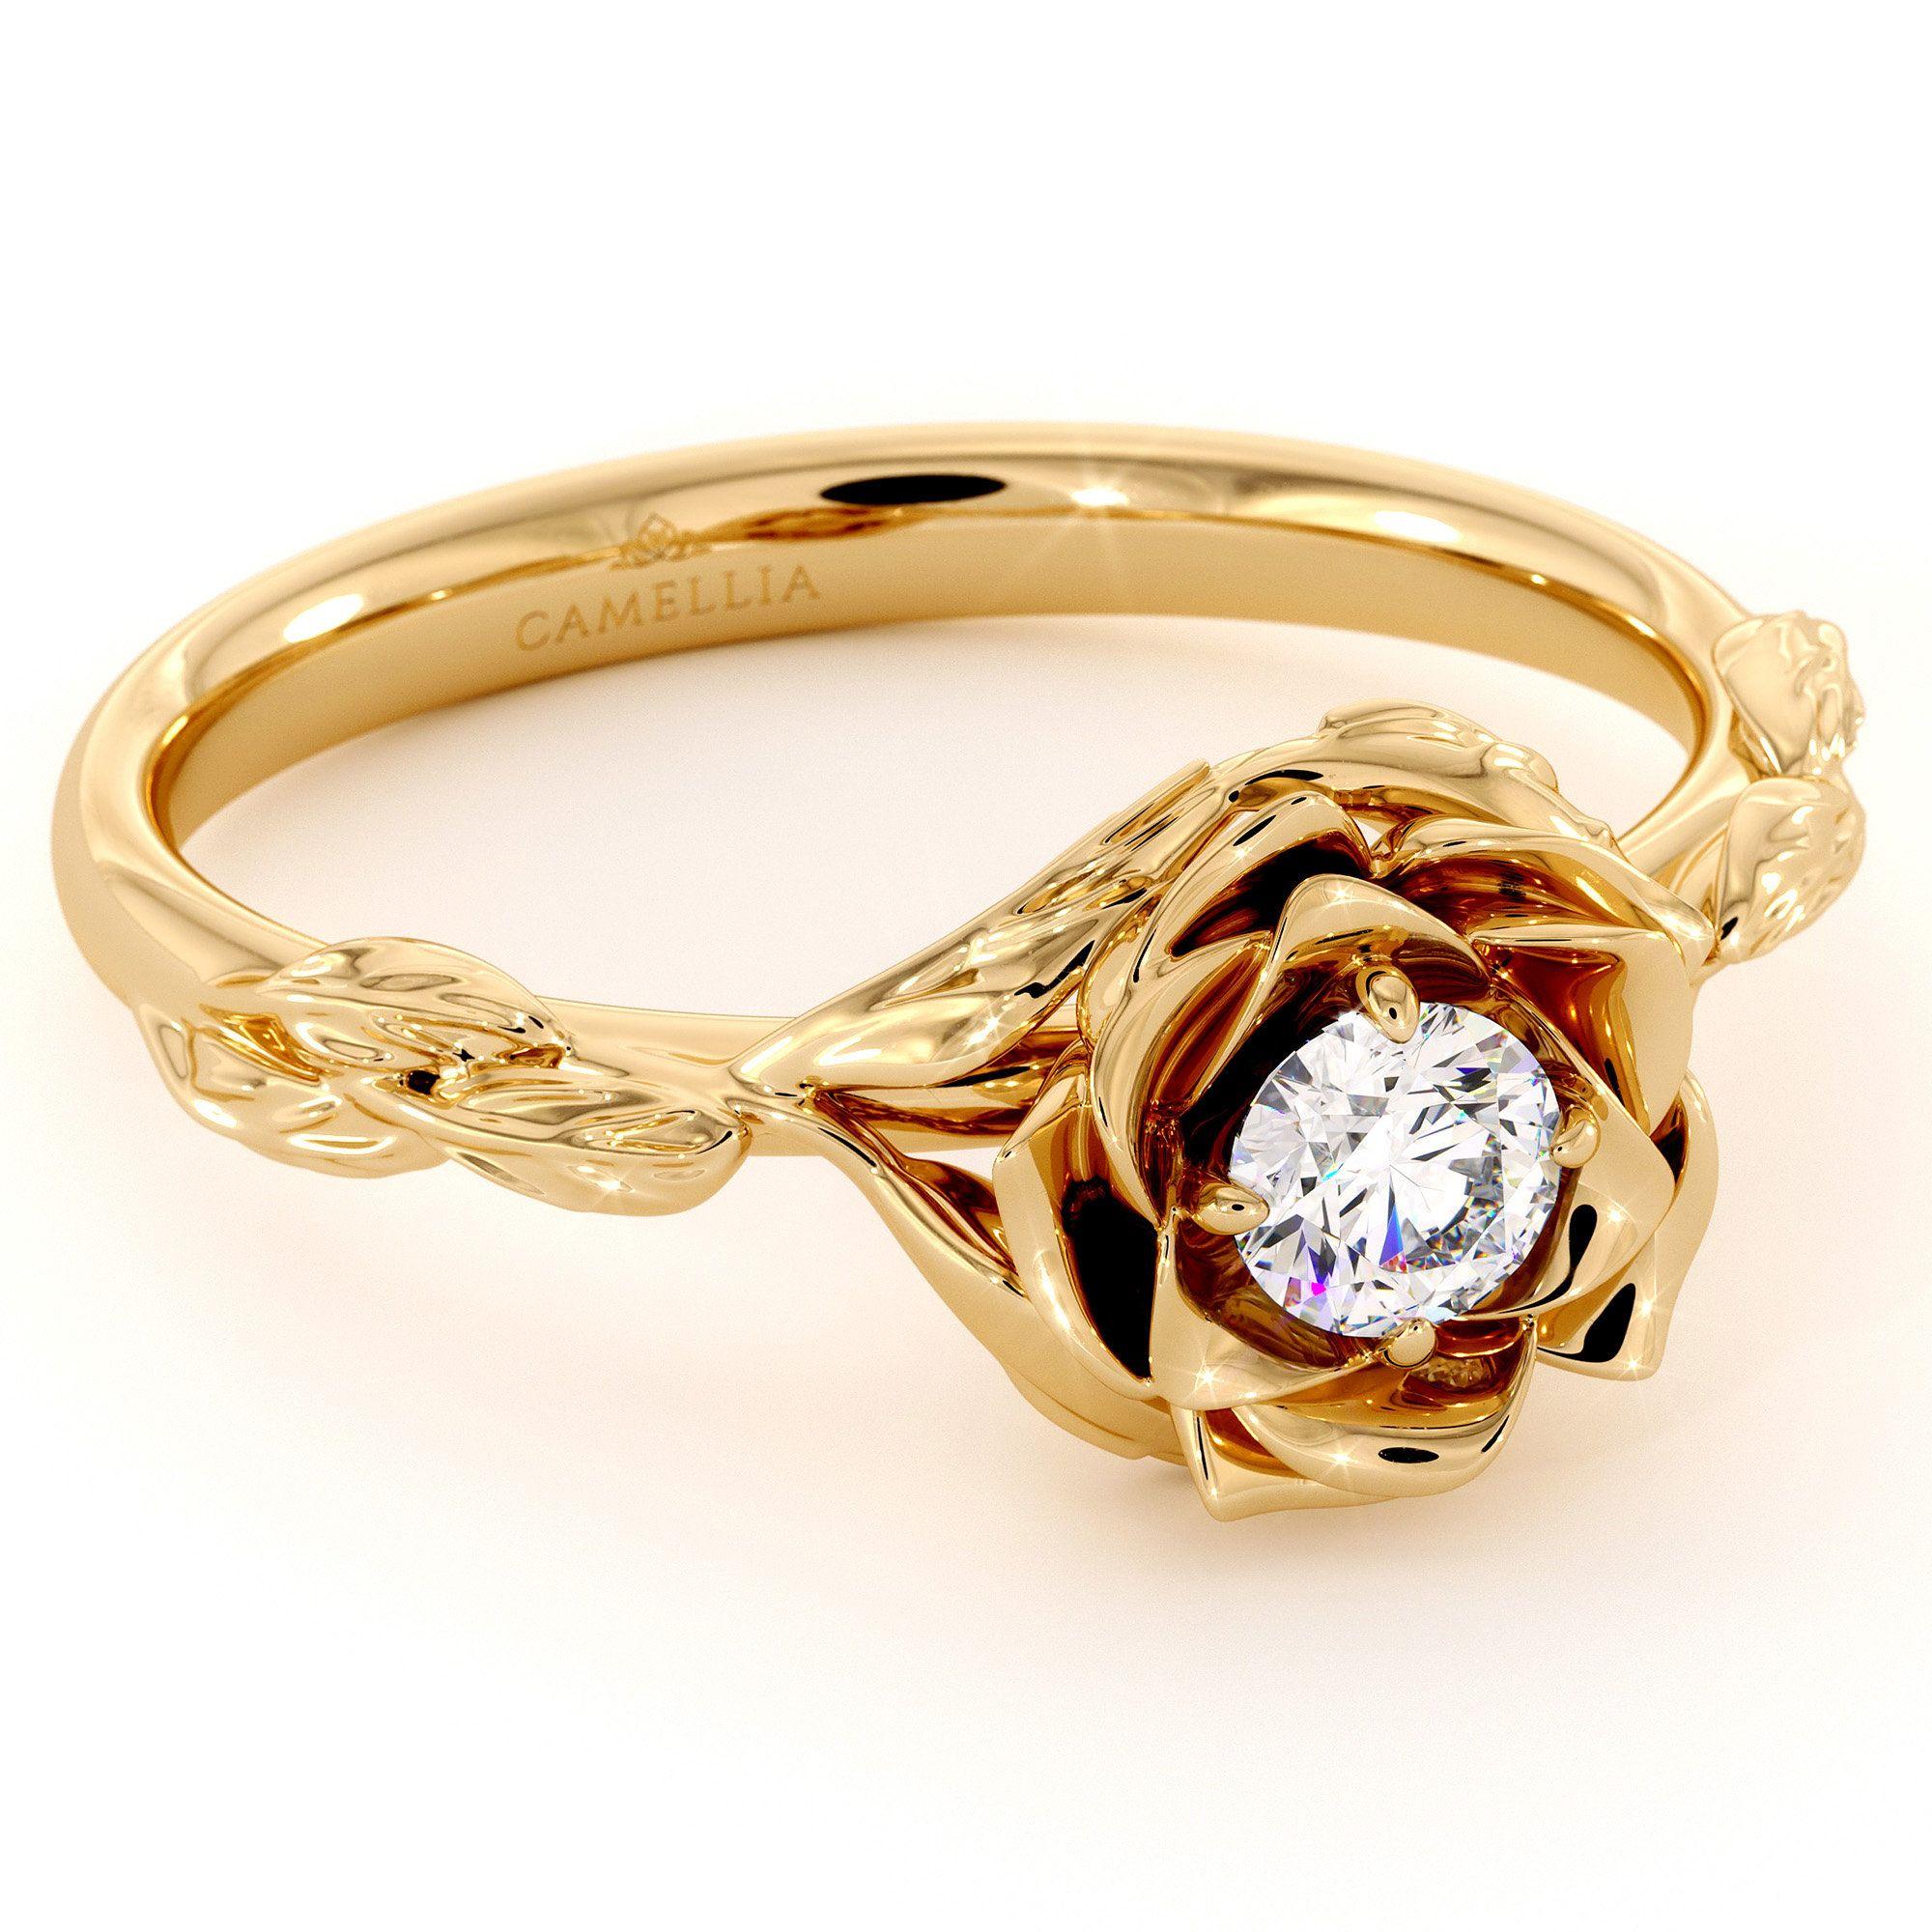 Diamond engagement ring flower engagement ring yellow gold